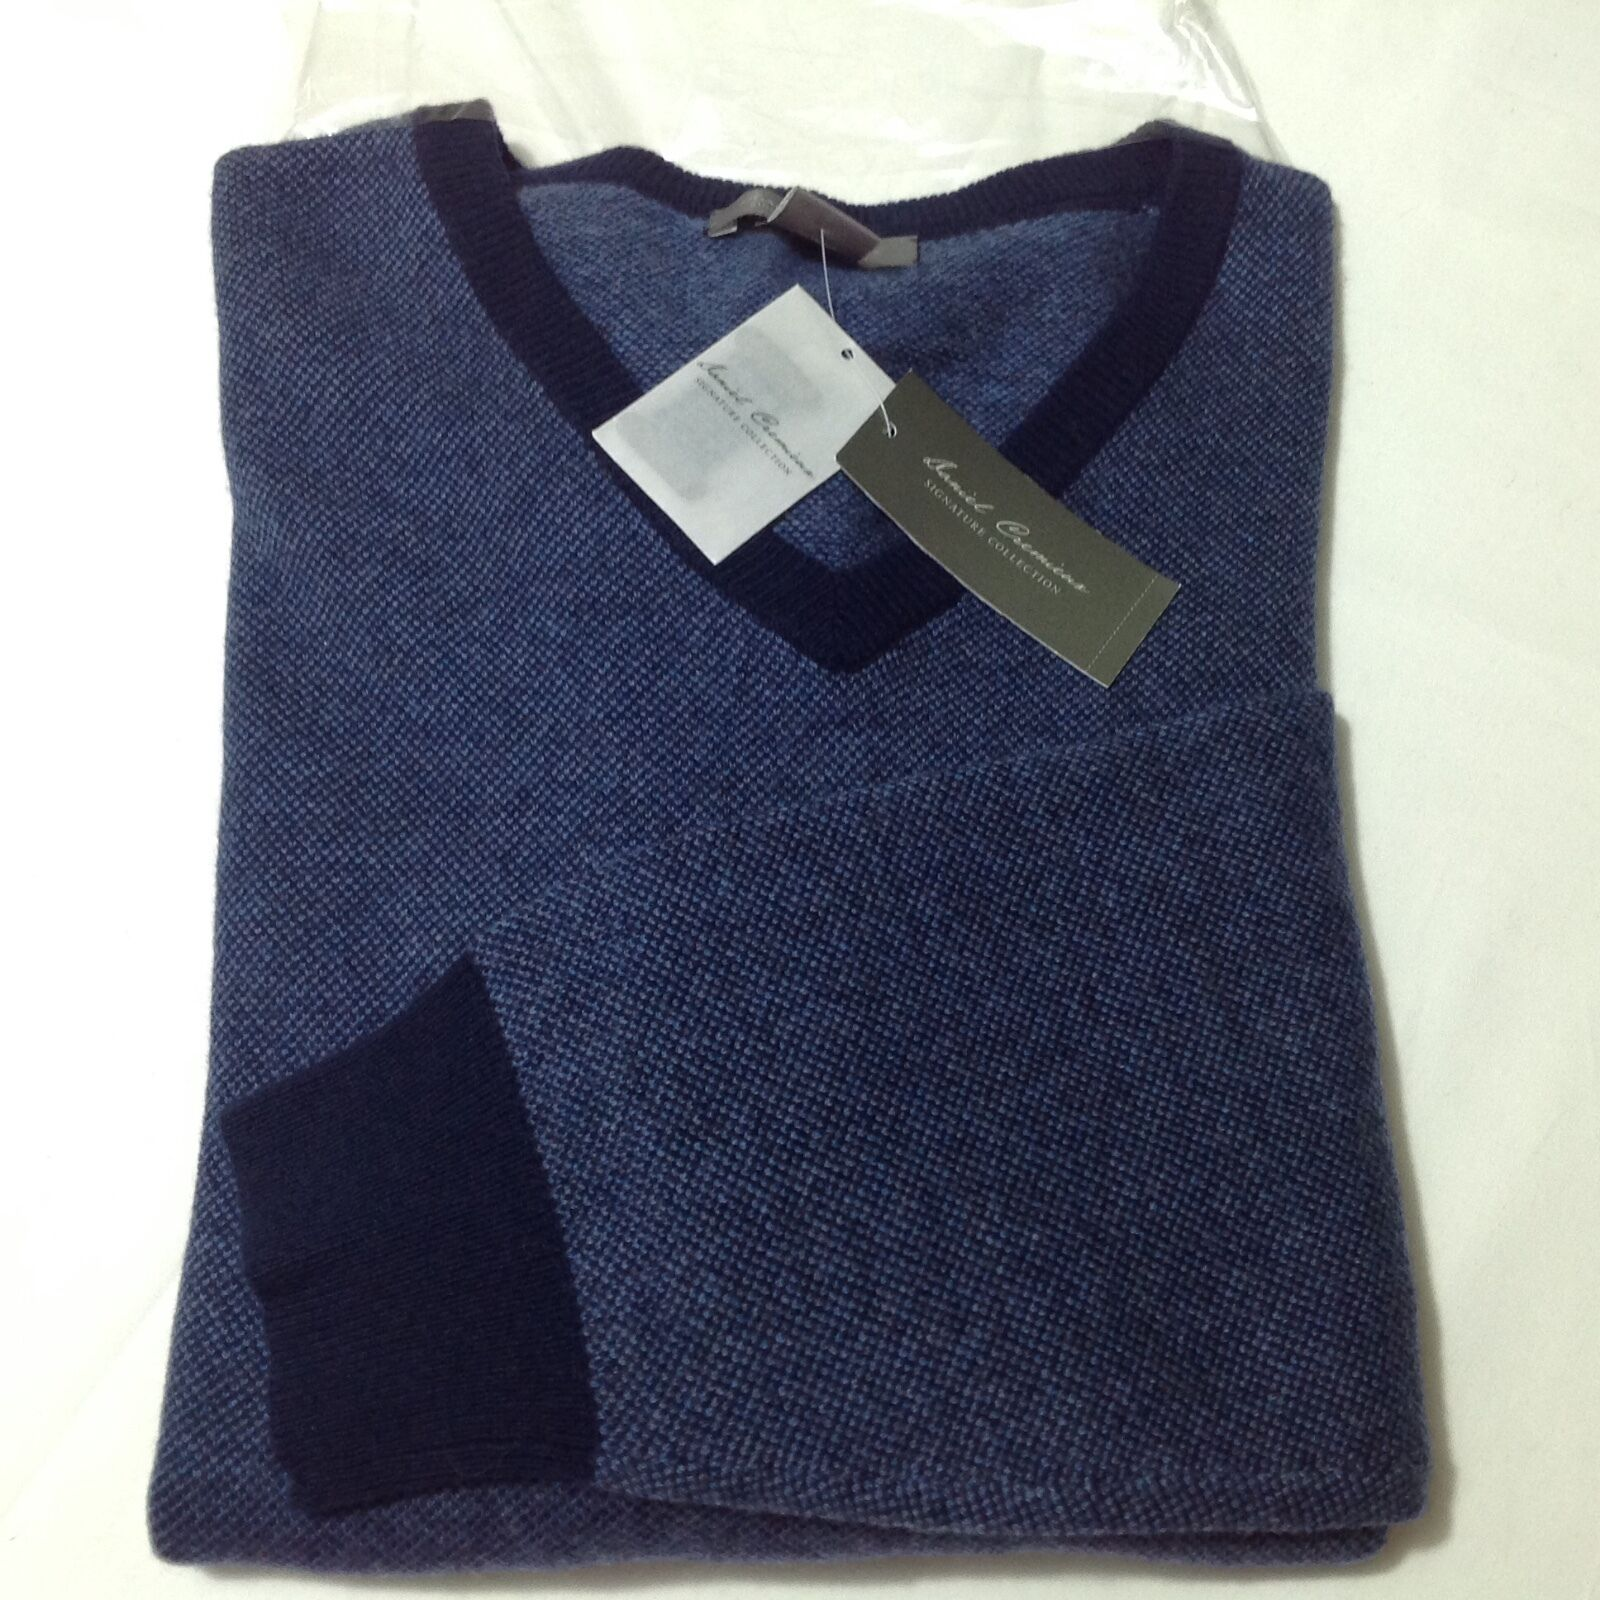 Cremieux Signature Luxury Wool/Cashmere Navy Heather Men Sweater XXL NWT195